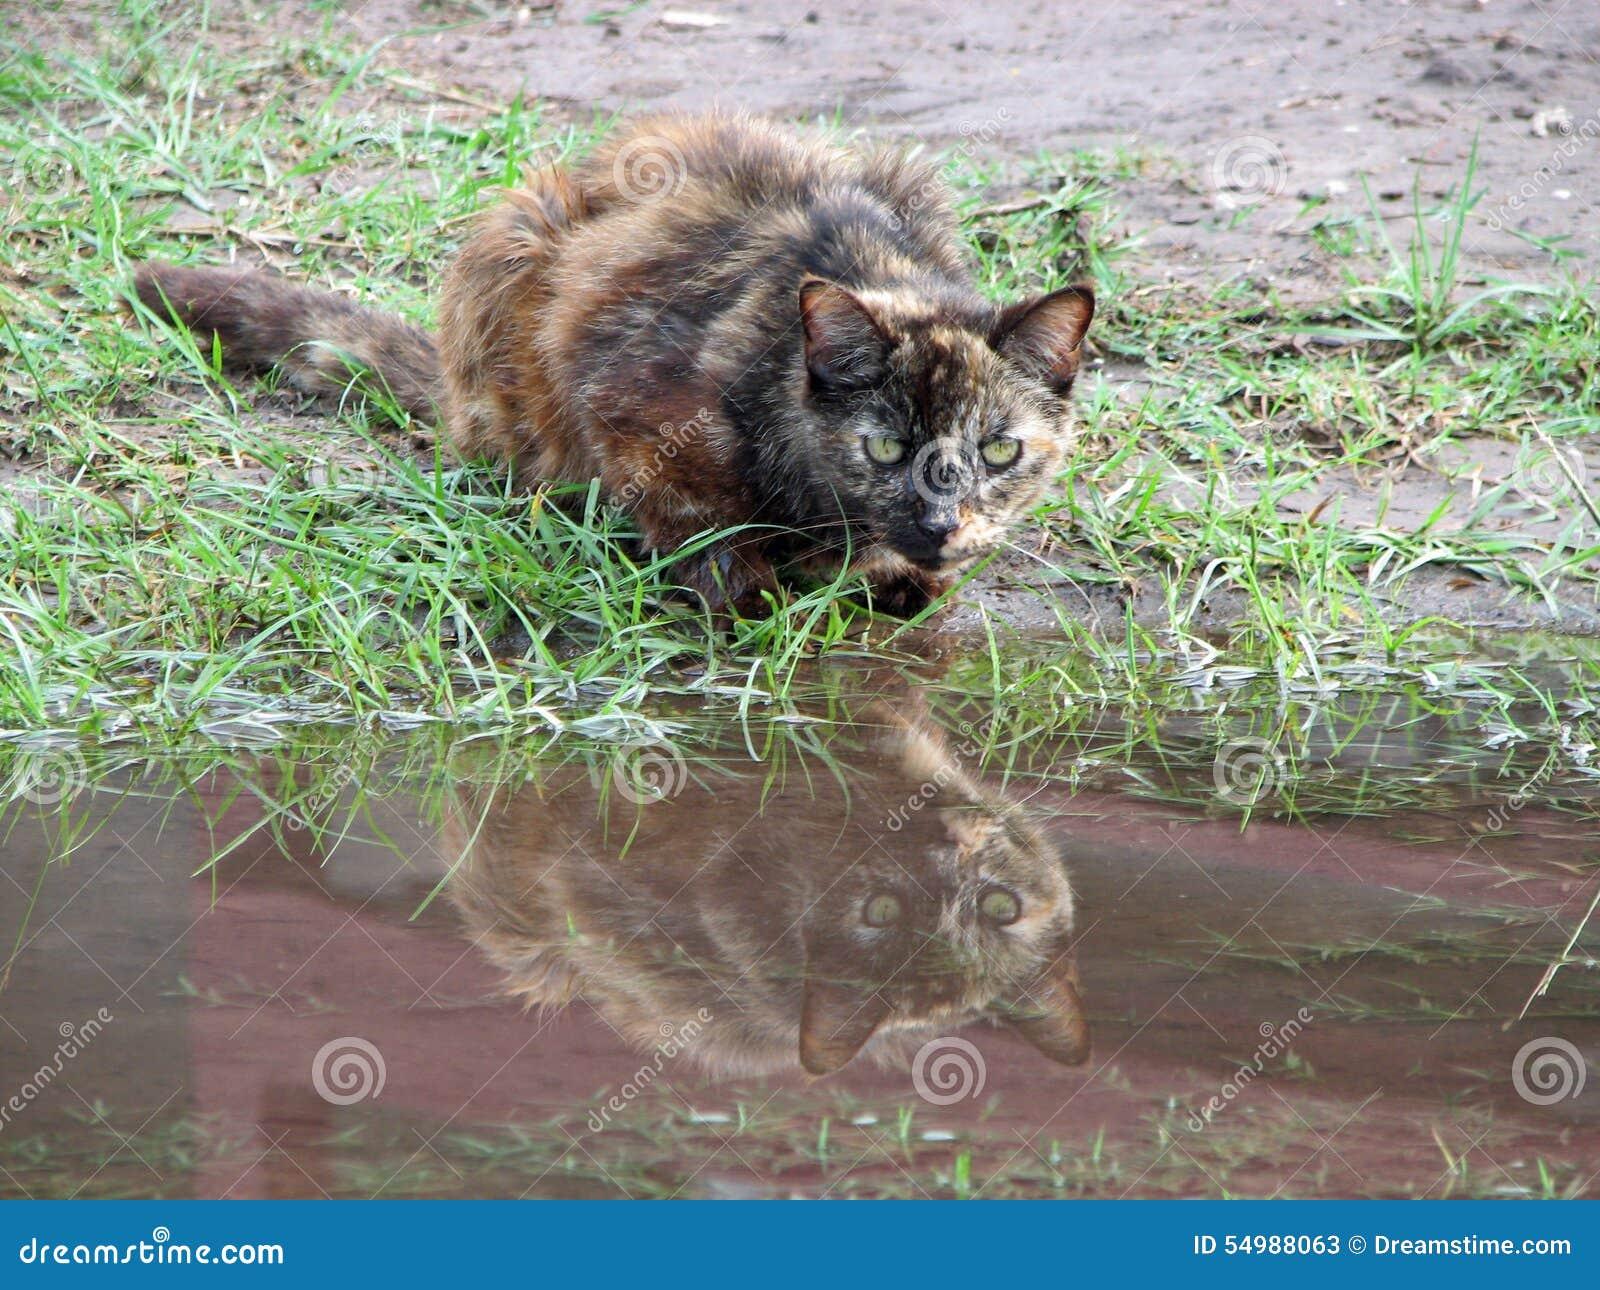 Cat Reflection